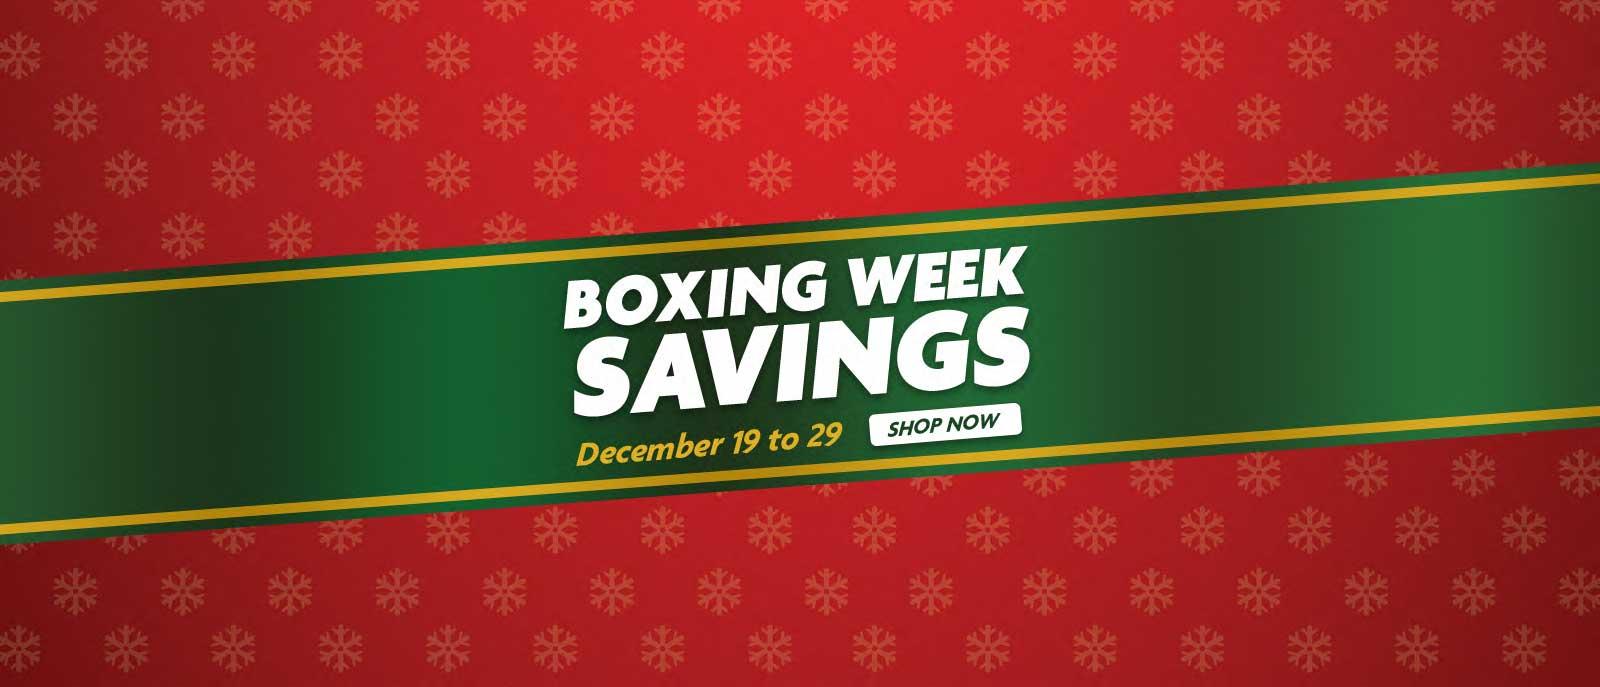 Boxing Week Savings - Dec19-29-Banner